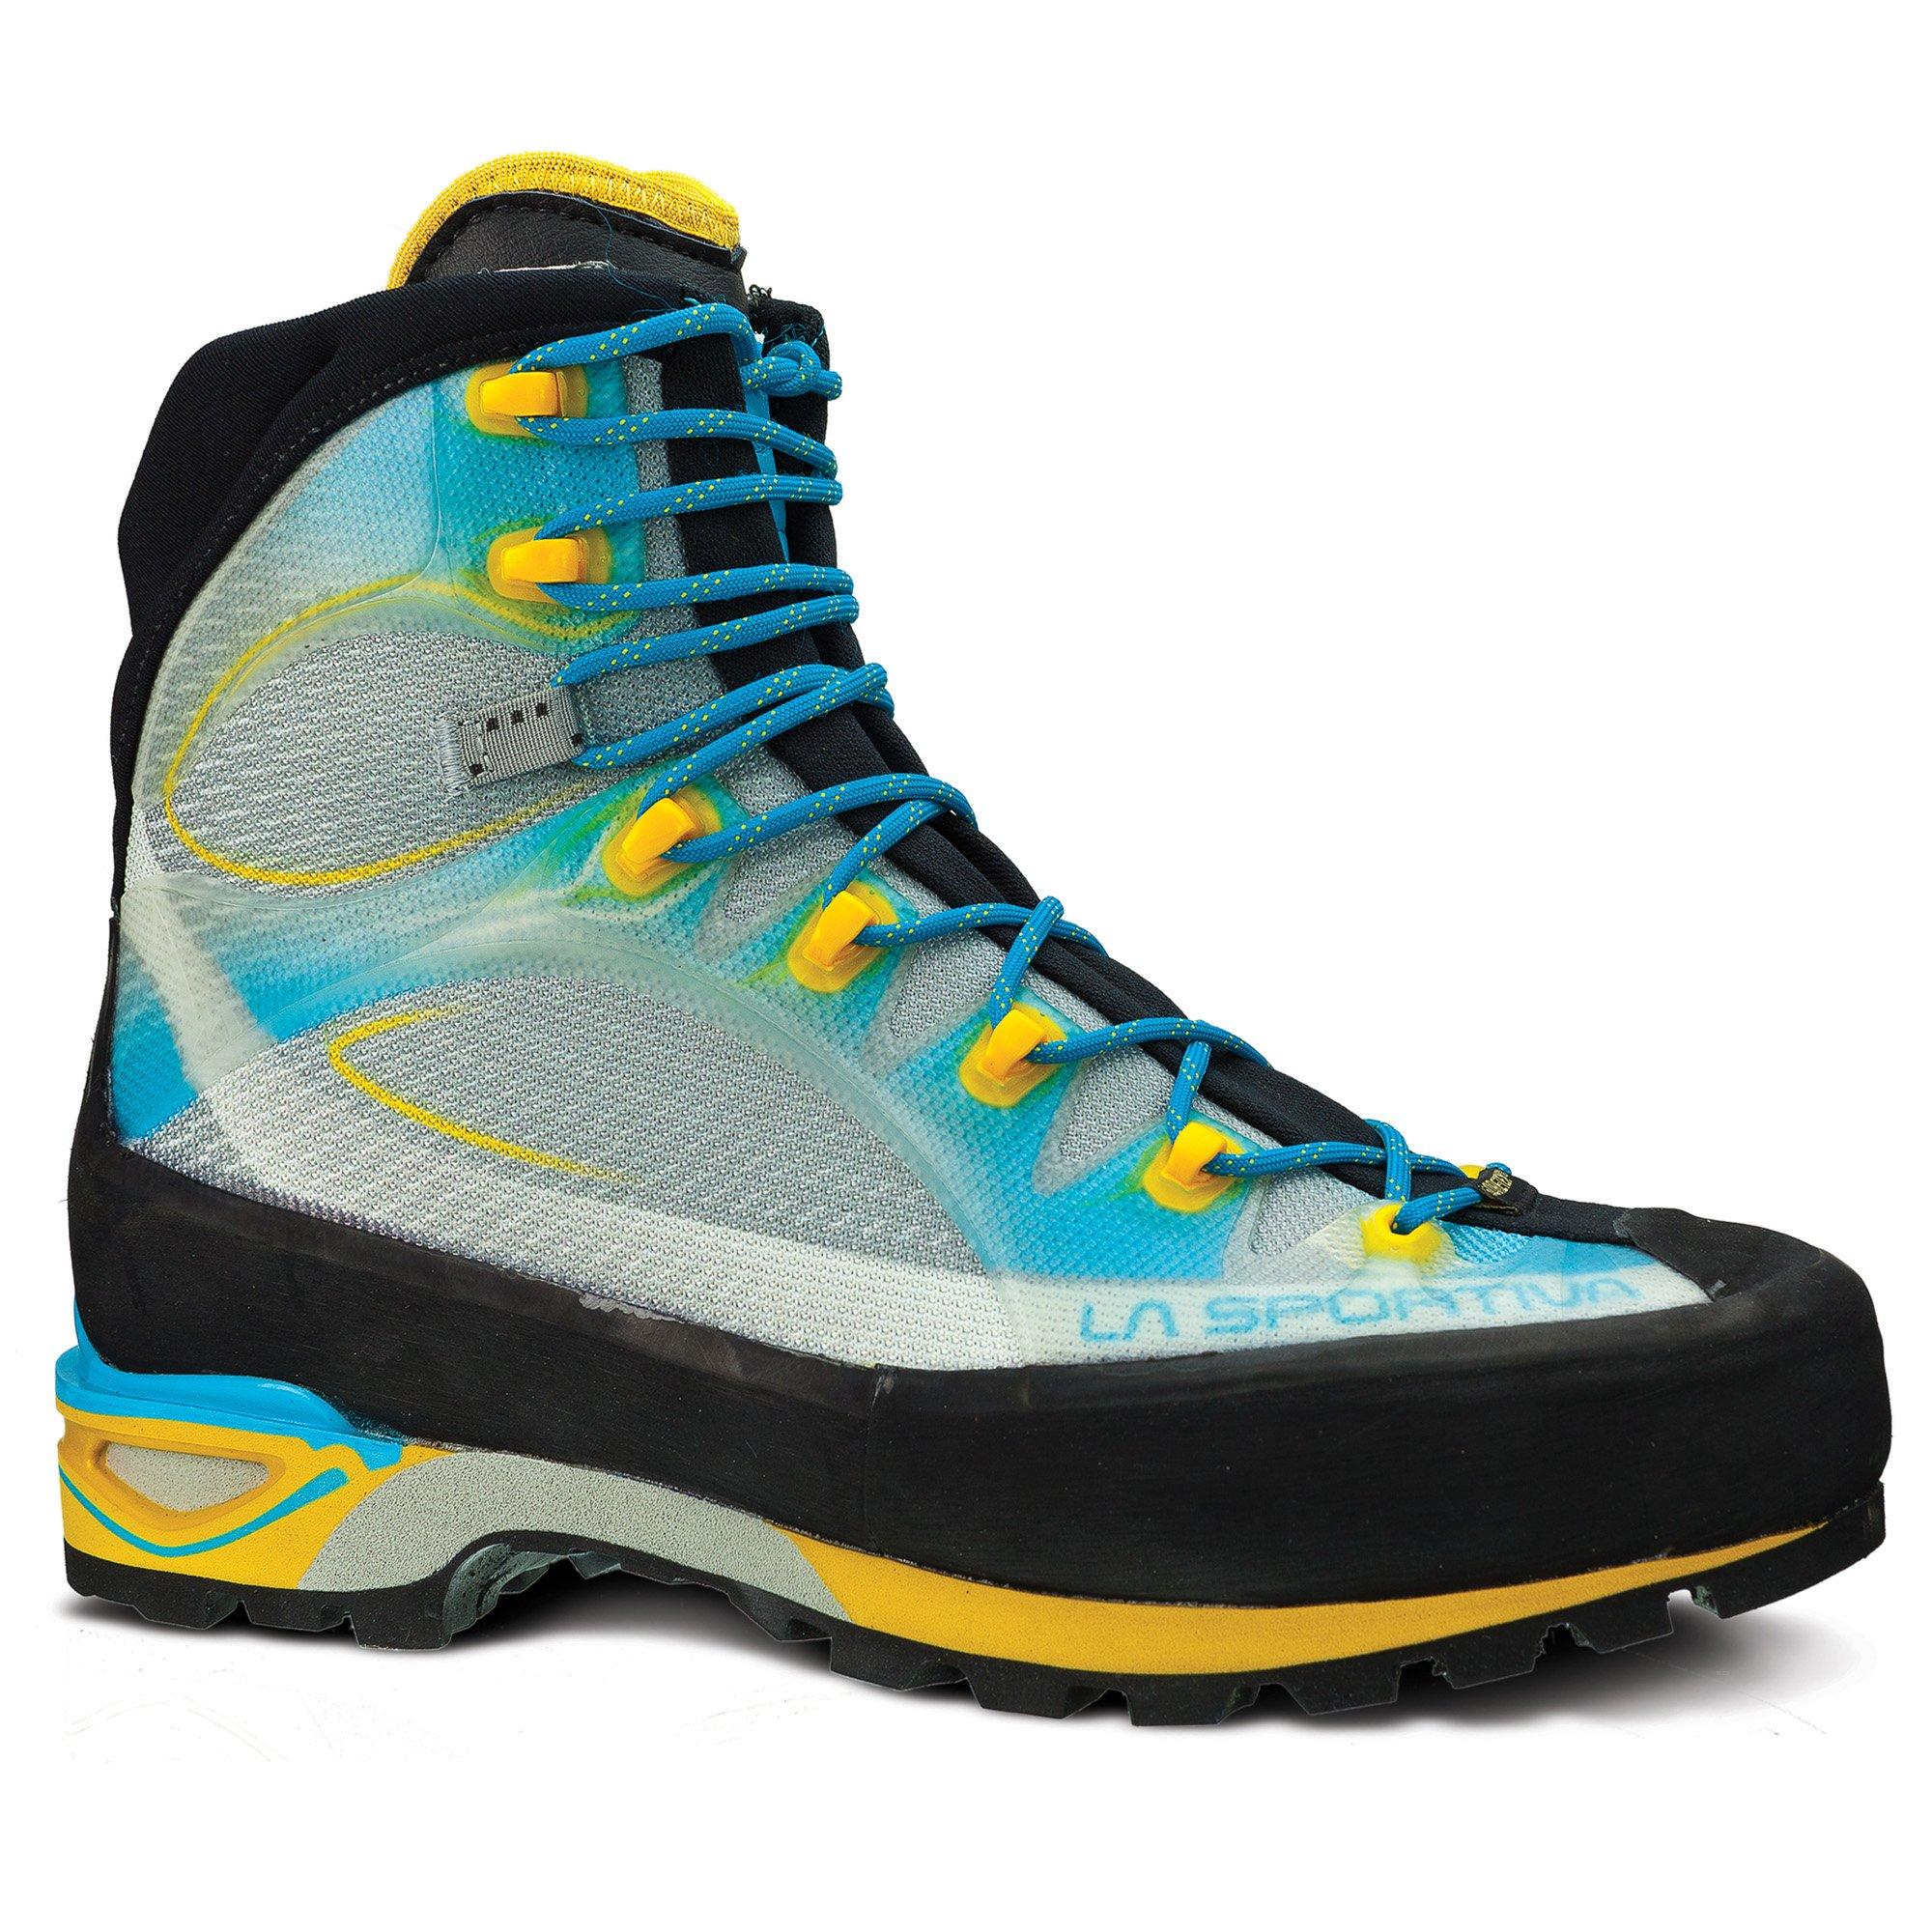 La Sportiva Trango Cube GTX Mountaineering Boot - Women's Malibu Blue/Yellow 42.5 by La Sportiva